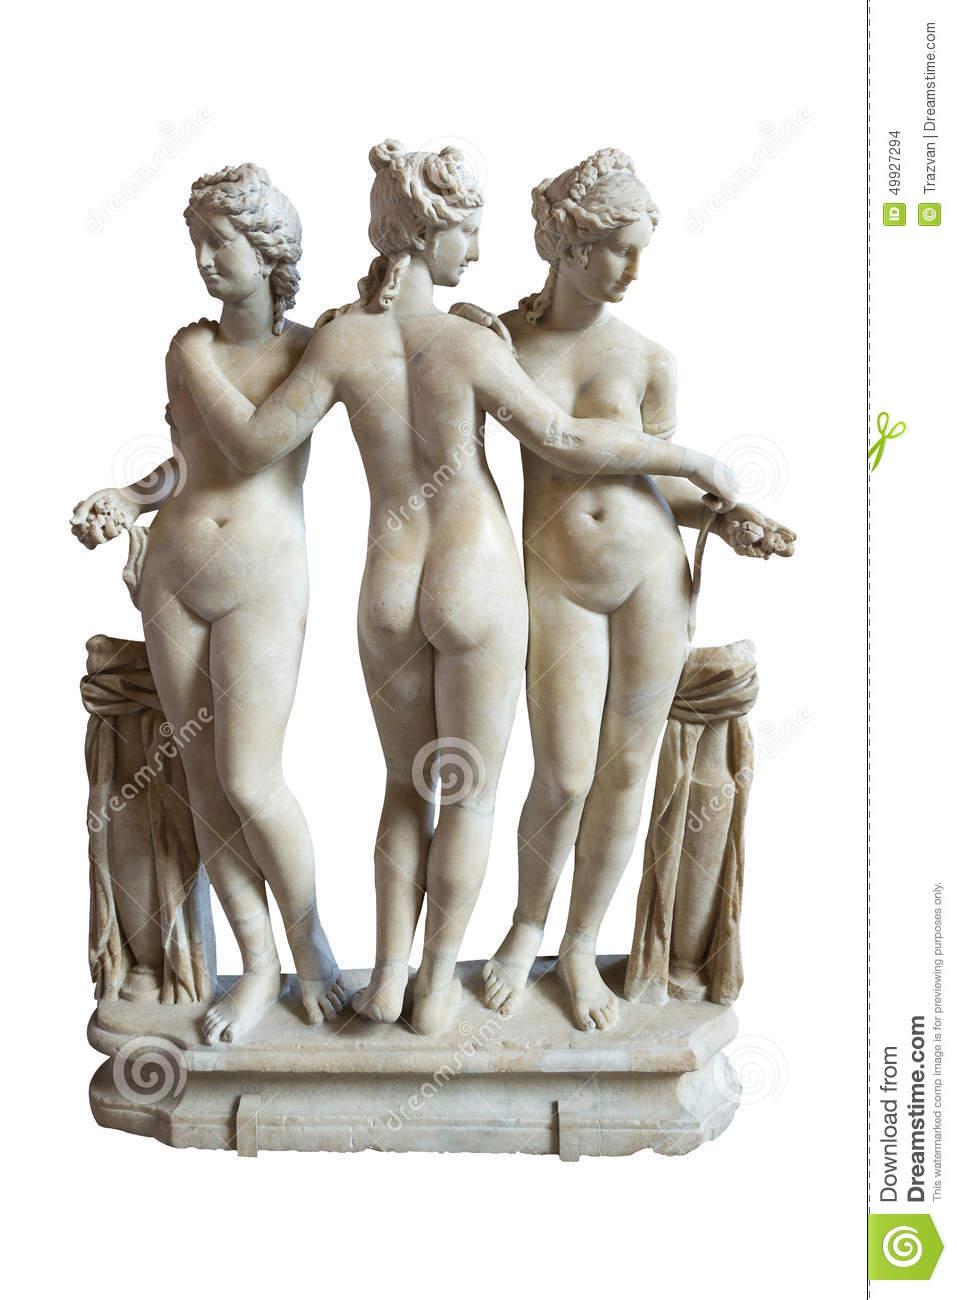 The Three Graces Sculpture.